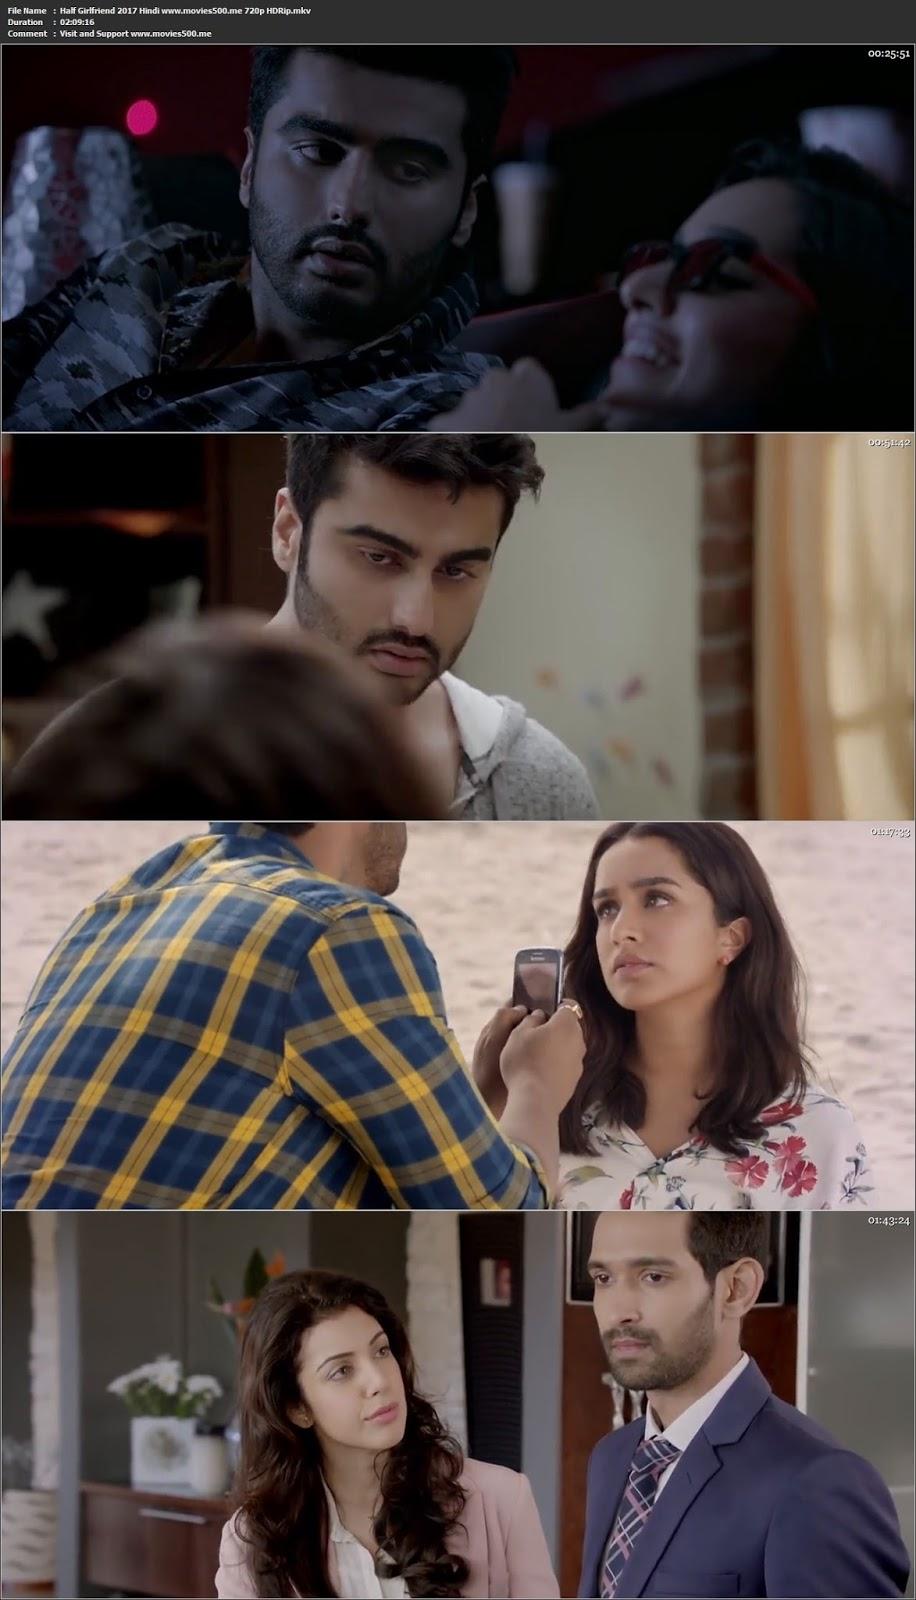 Half Girlfriend 2017 Full Movie Hindi HDRip 720p at softwaresonly.com